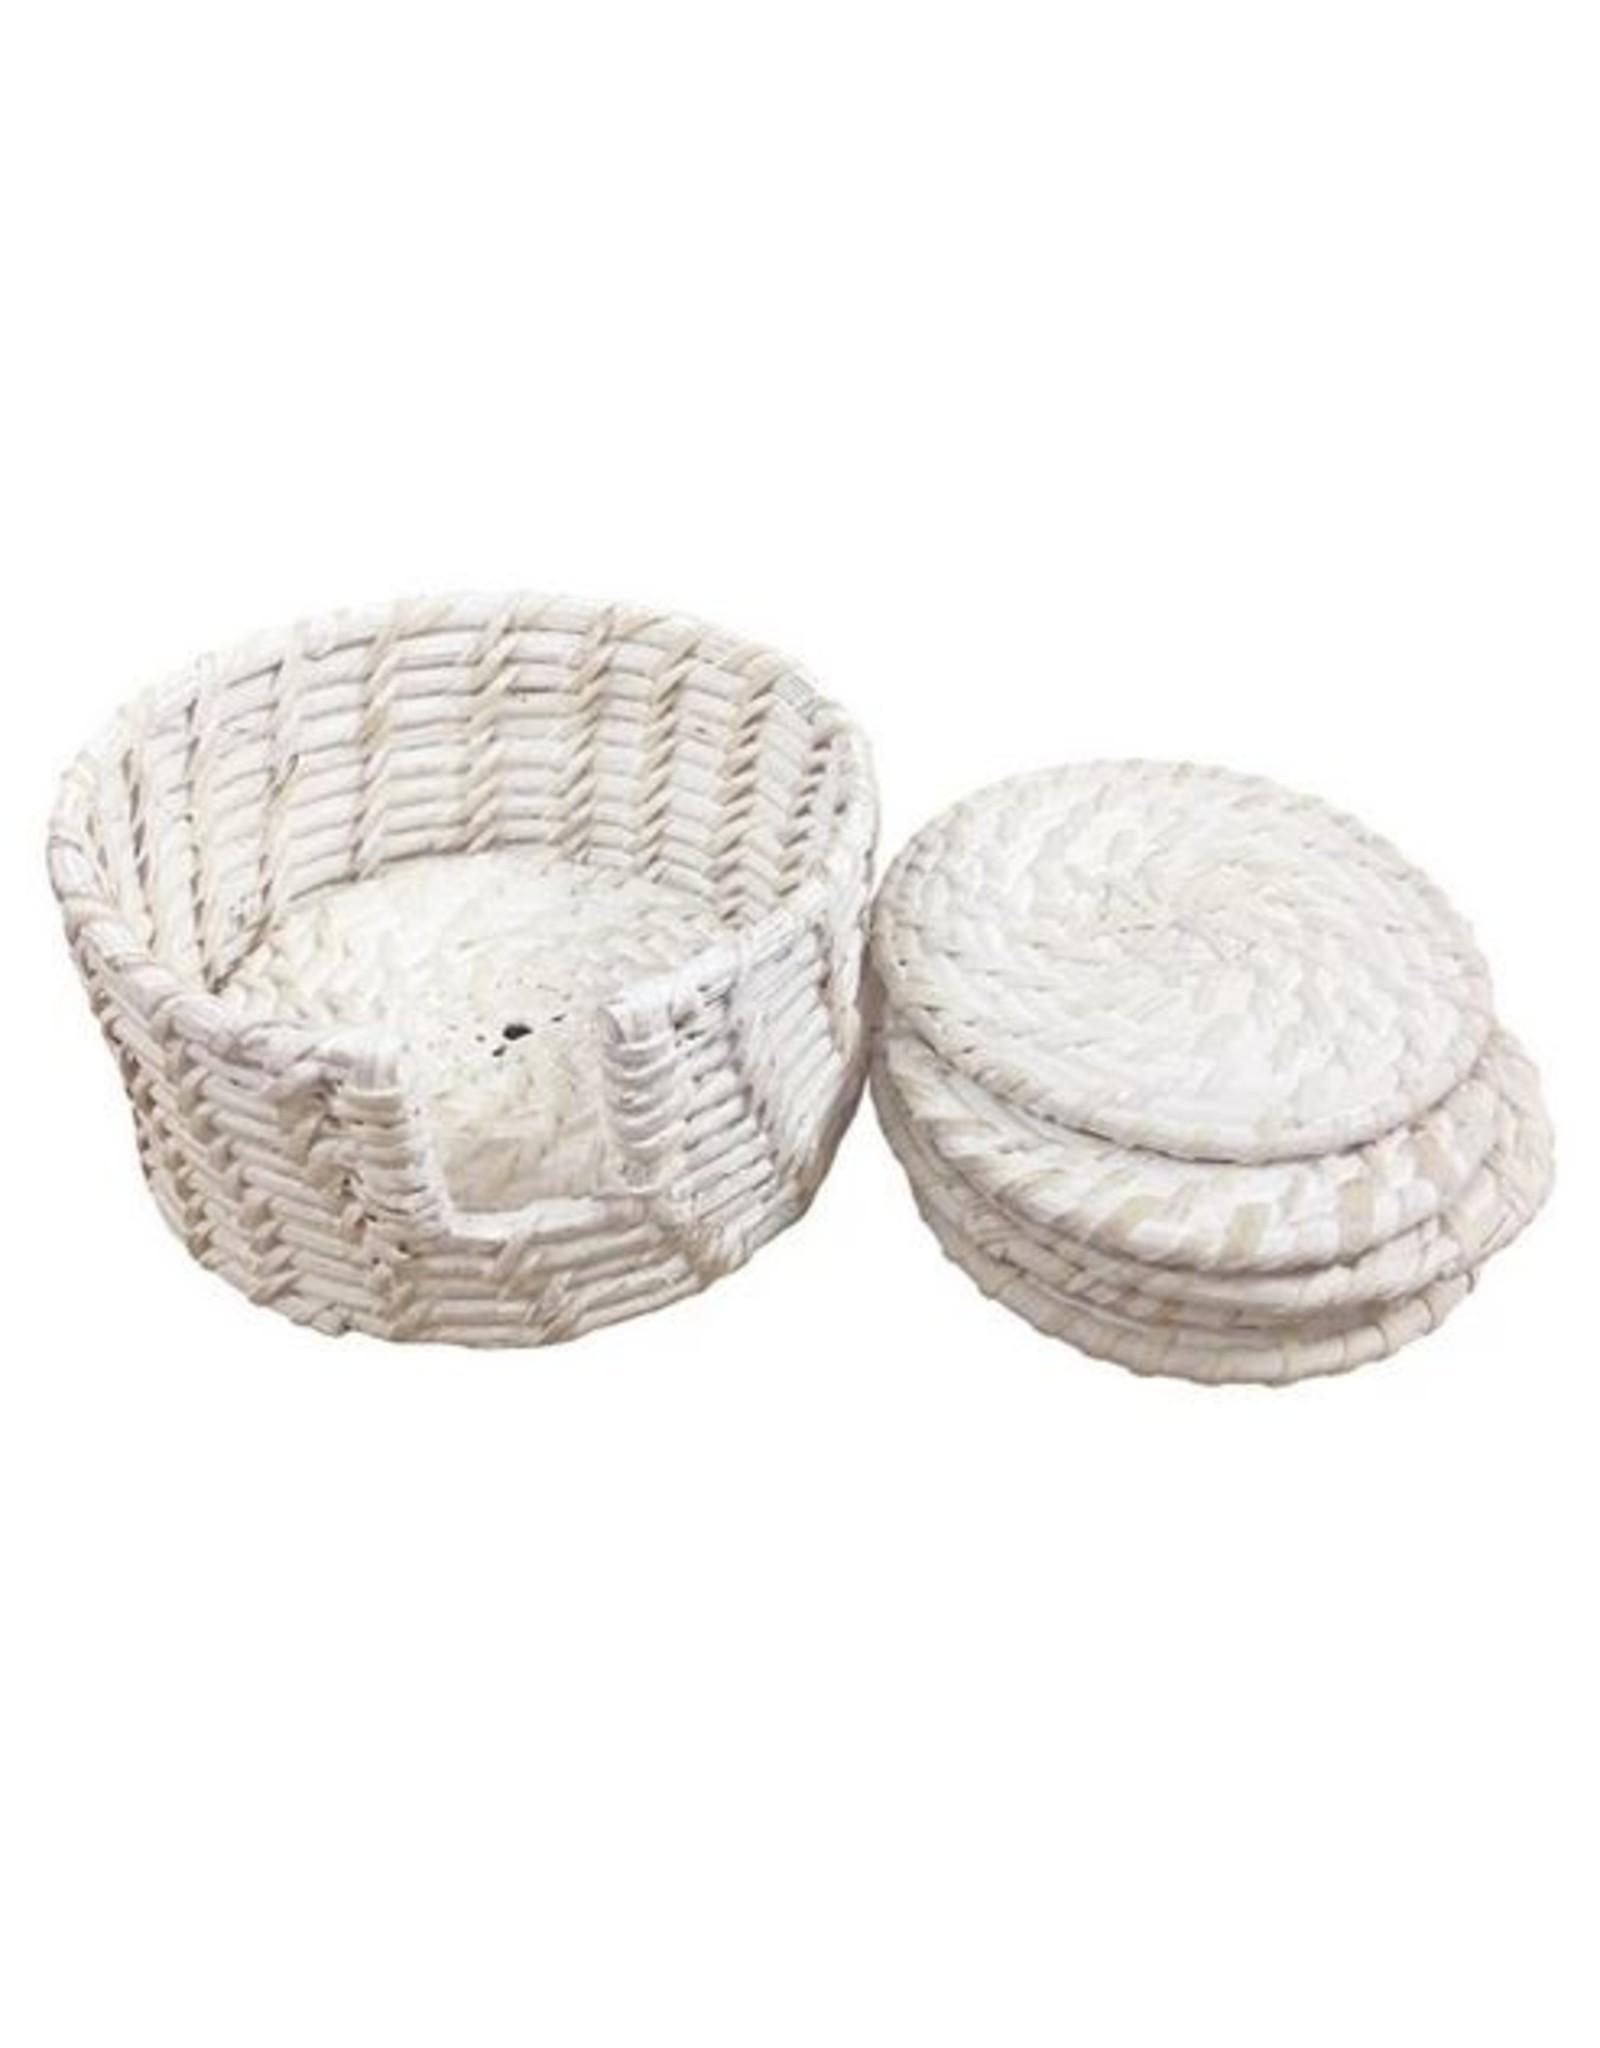 Pacifica Rattan Coaster Set of 6 Dia=12,H-6 ,Dia=10 White Wash